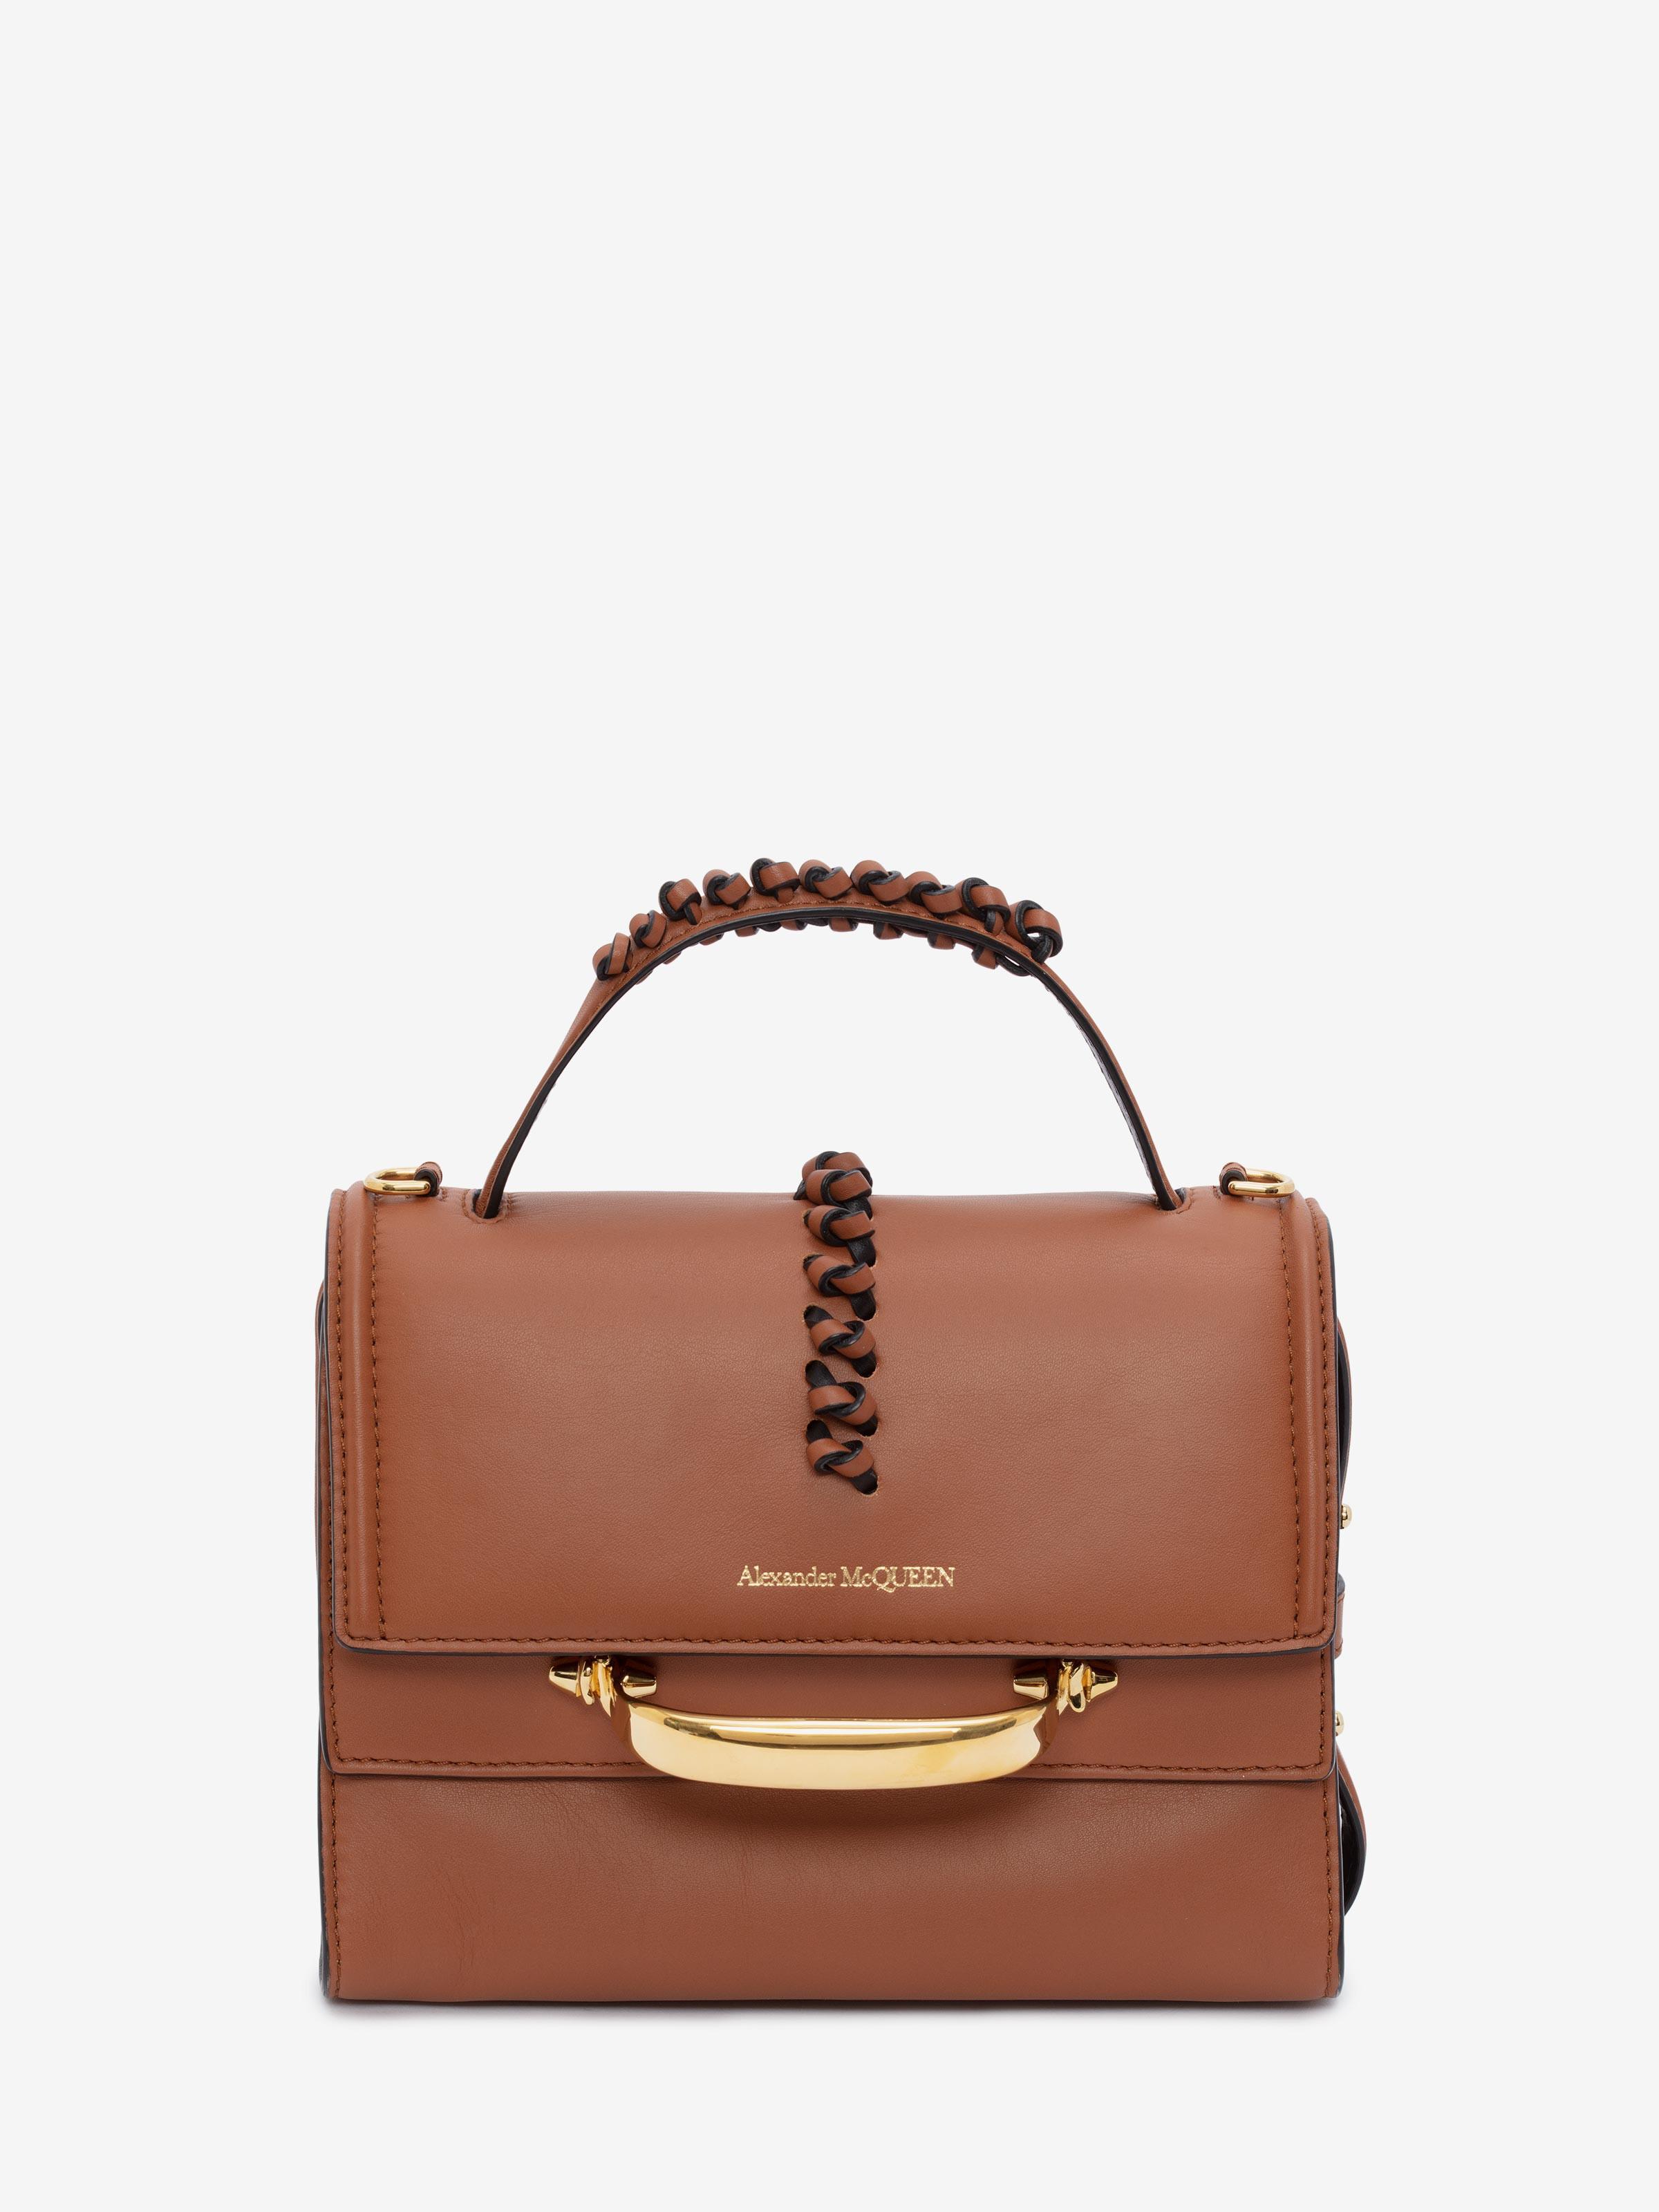 Alexander Mcqueen Women Handbag The Stroy Calfskin Logo Brown In Tan